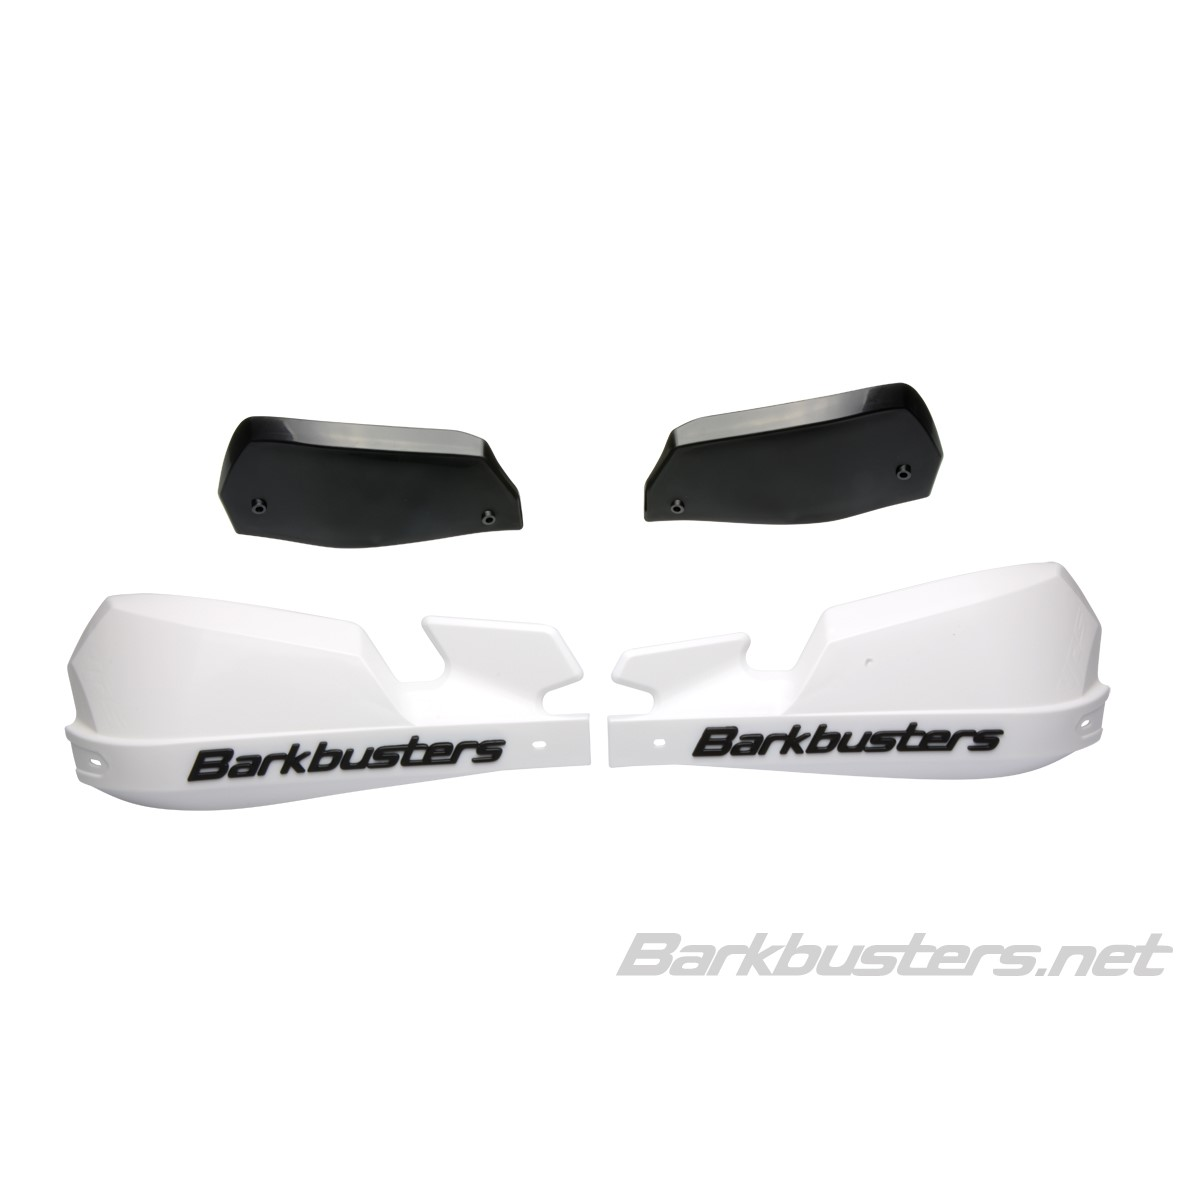 Barkbuster EGO WHITE Handguard Kit 22mm Two Point Straight Mount TRIAL//ENDURO